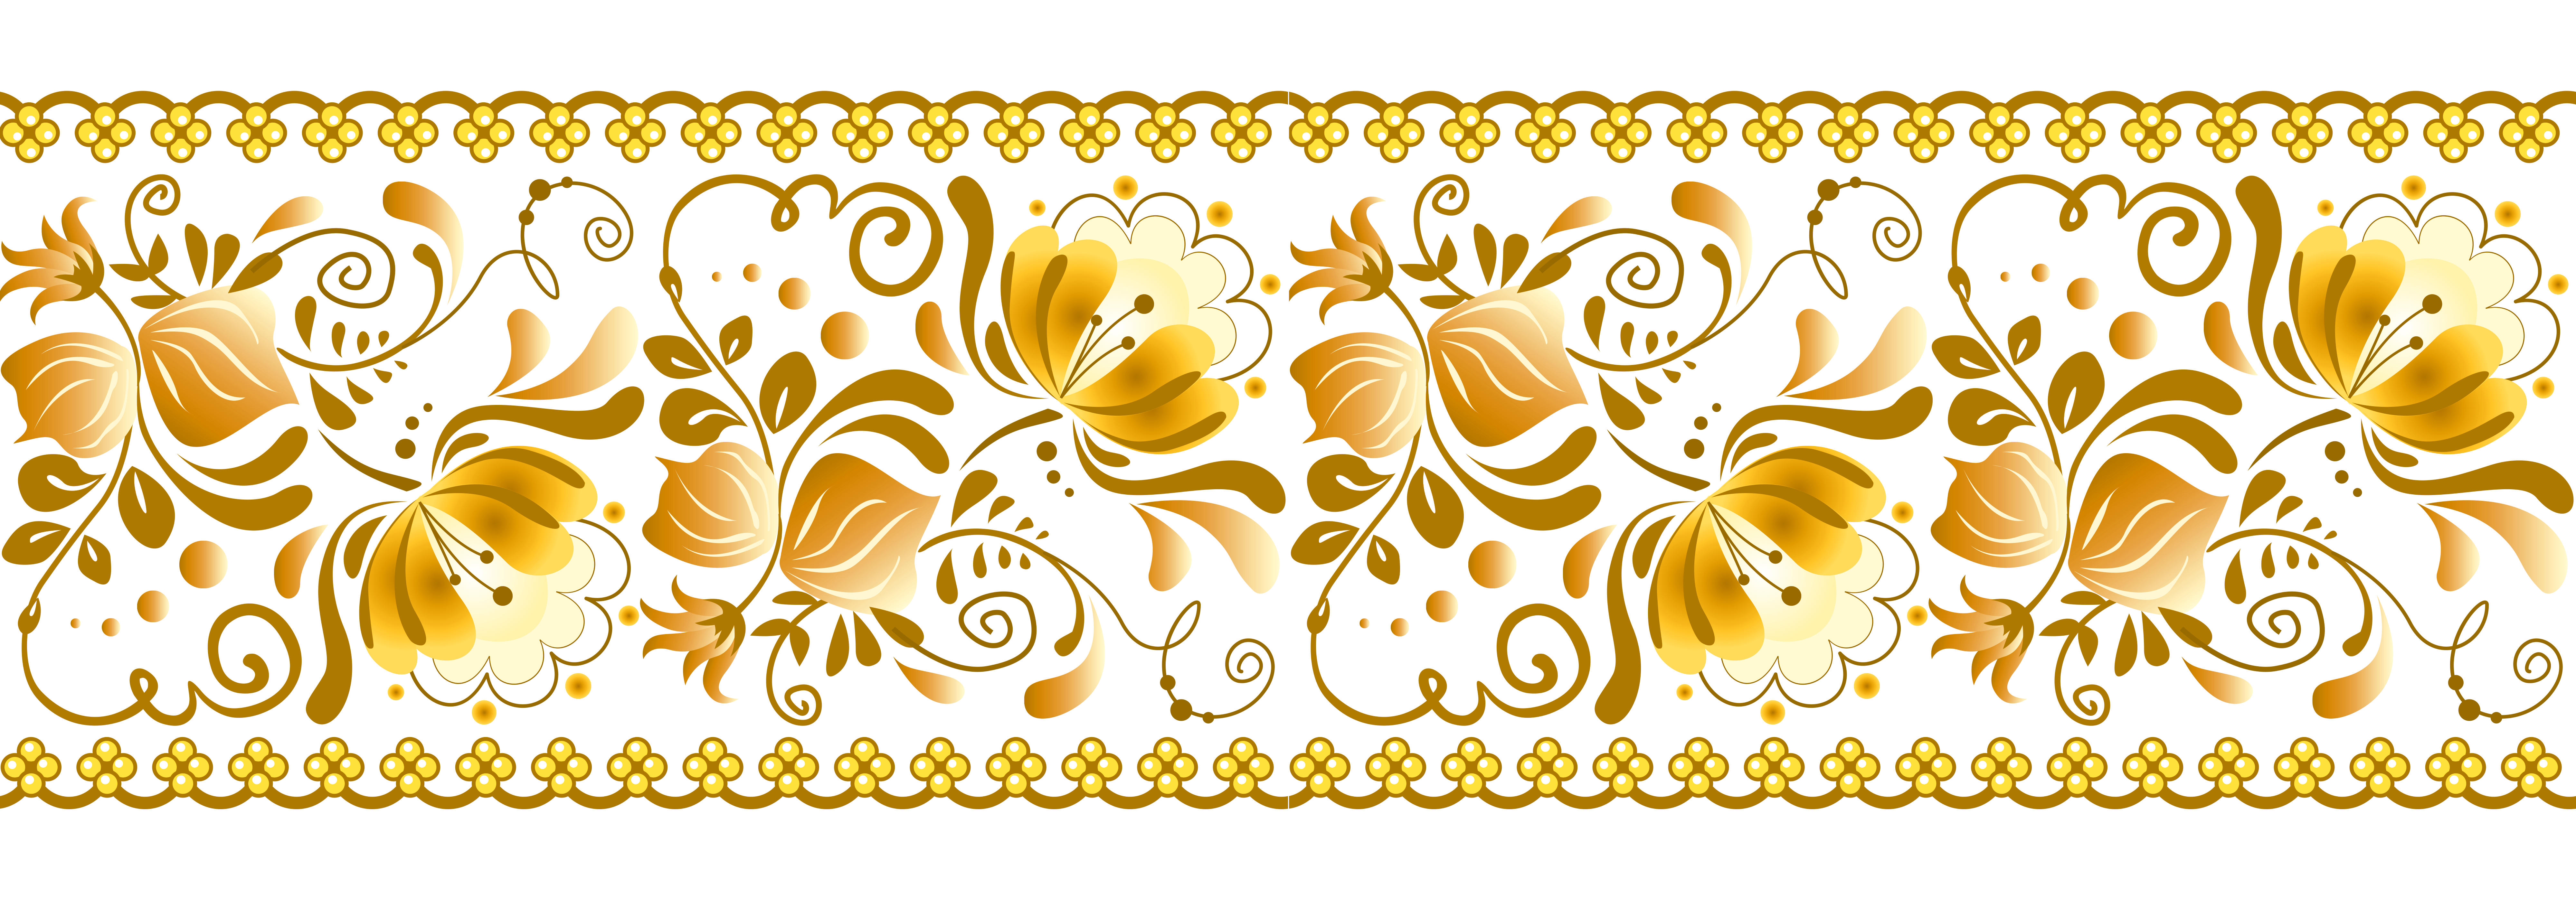 Decorative Clipart Png.